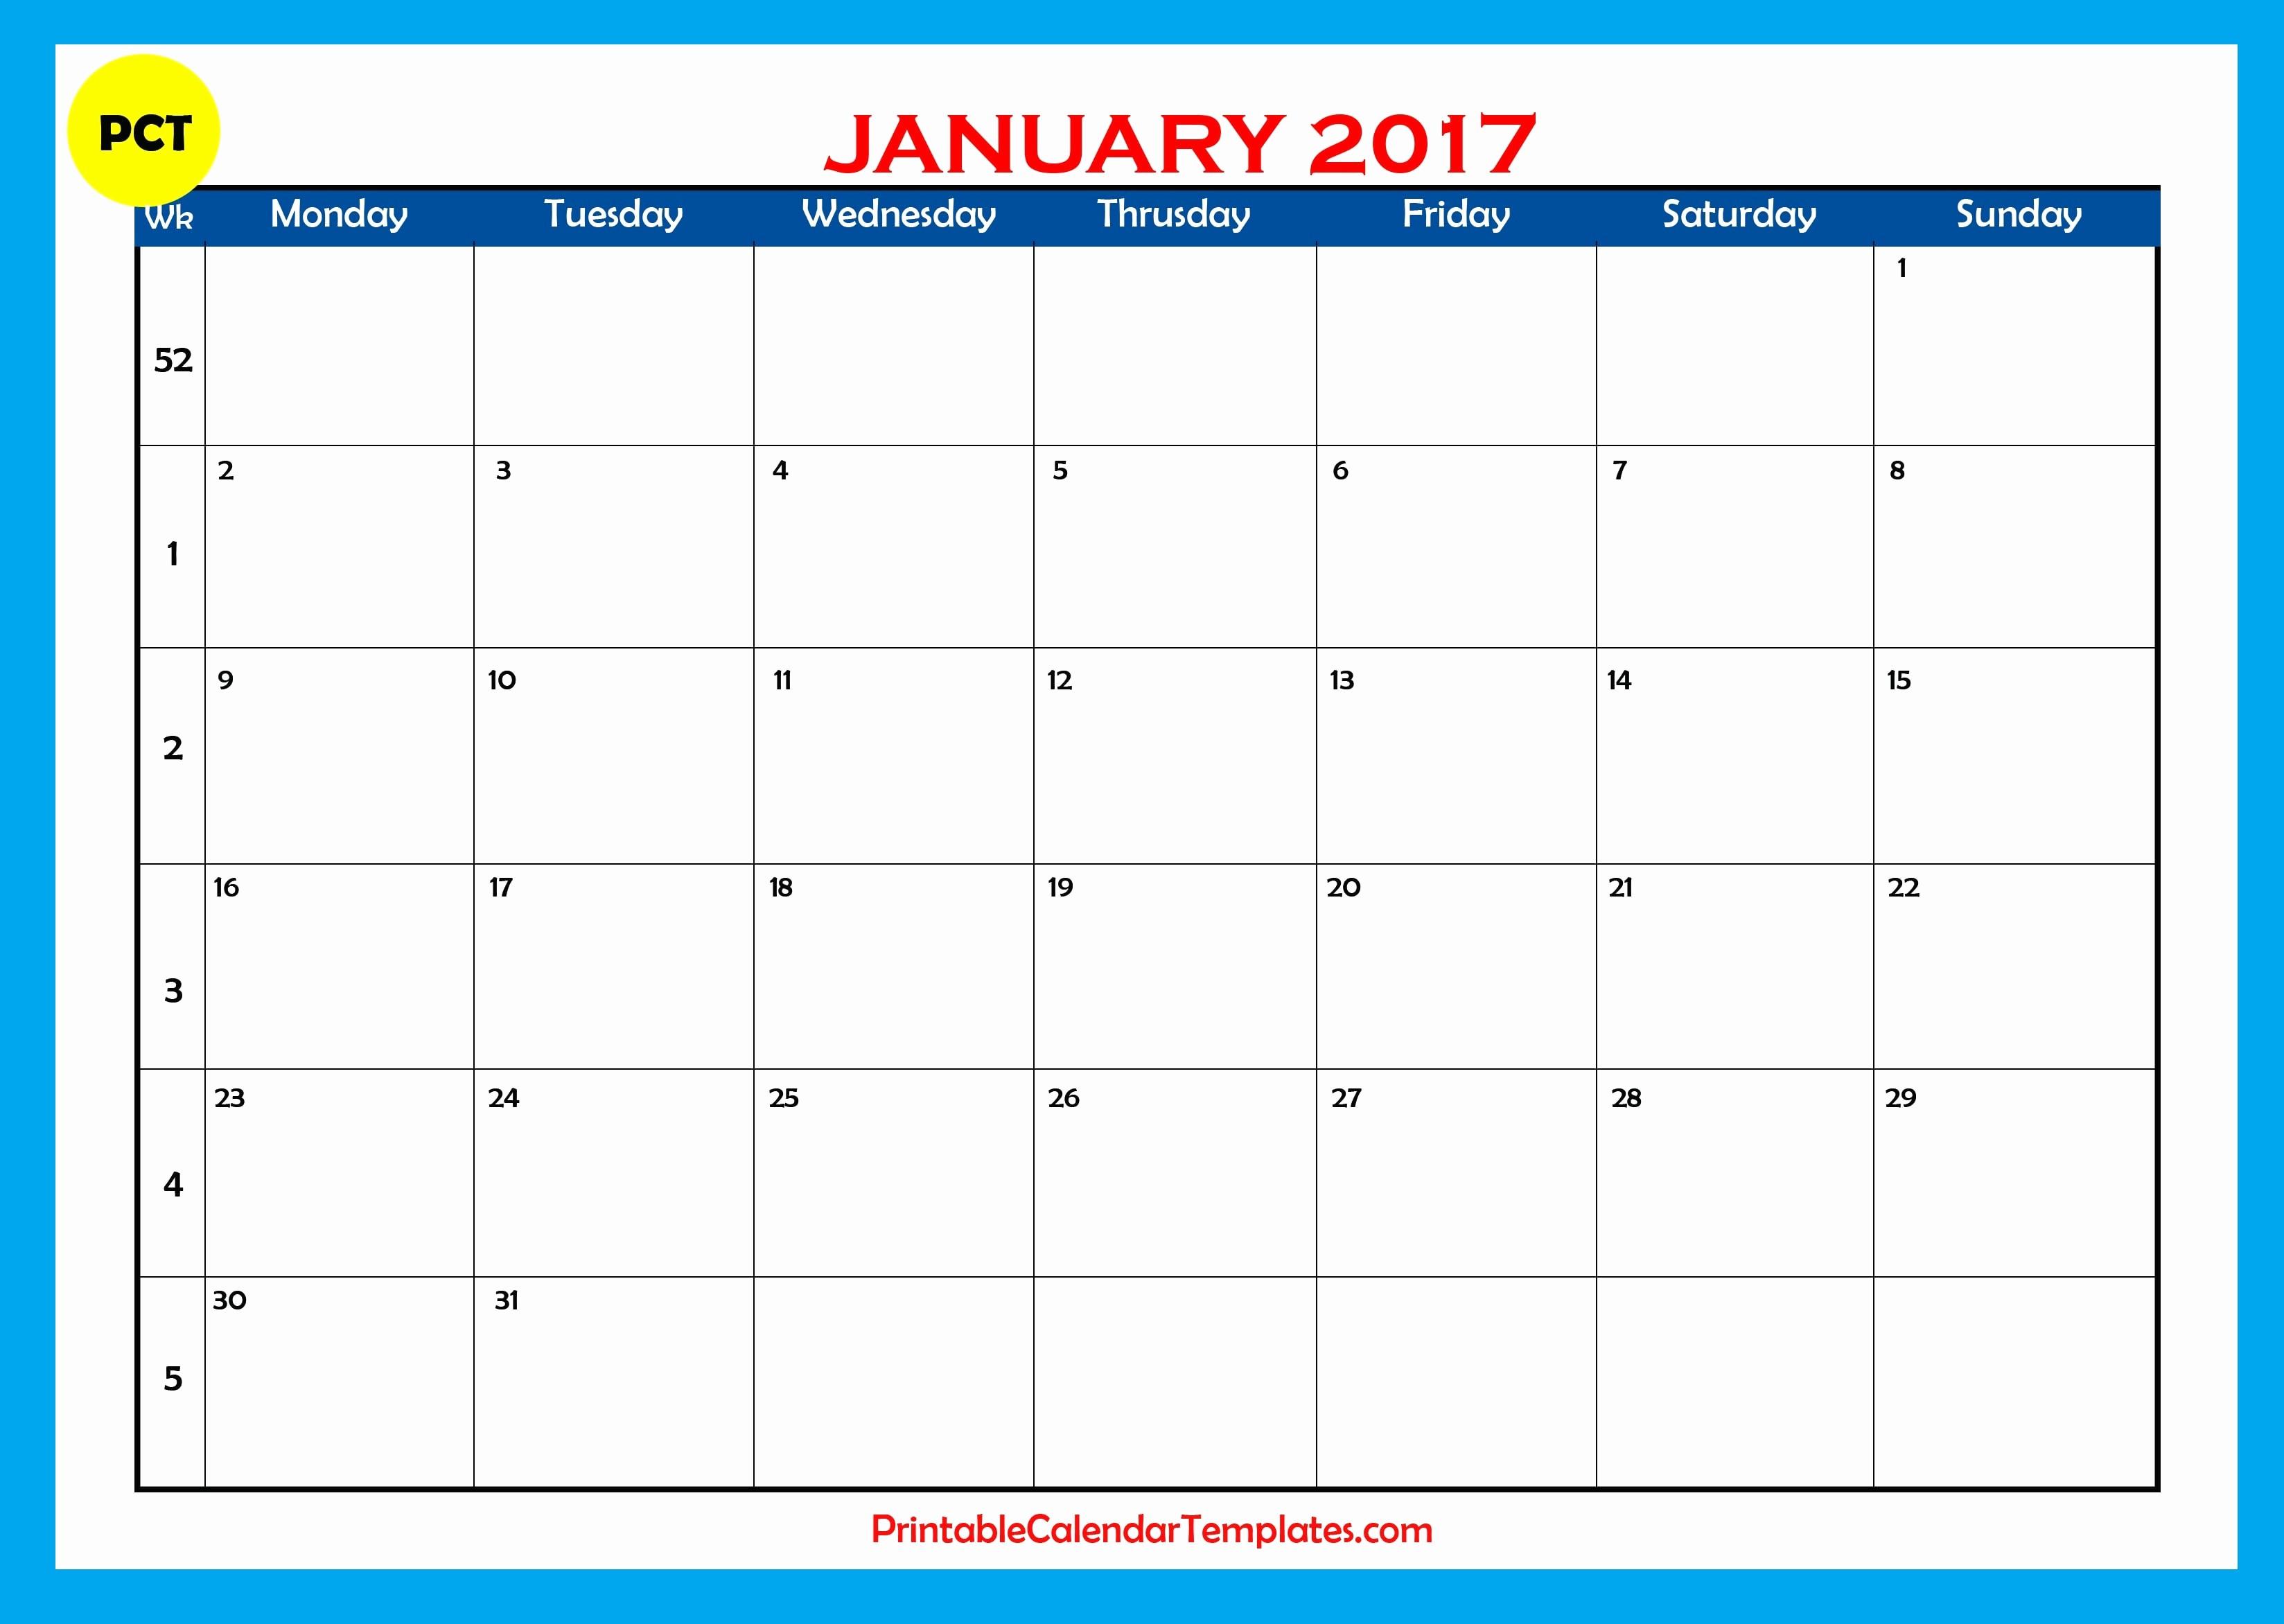 Free Printable Monthly 2017 Calendar Unique January 2017 Printable Calendar Templates